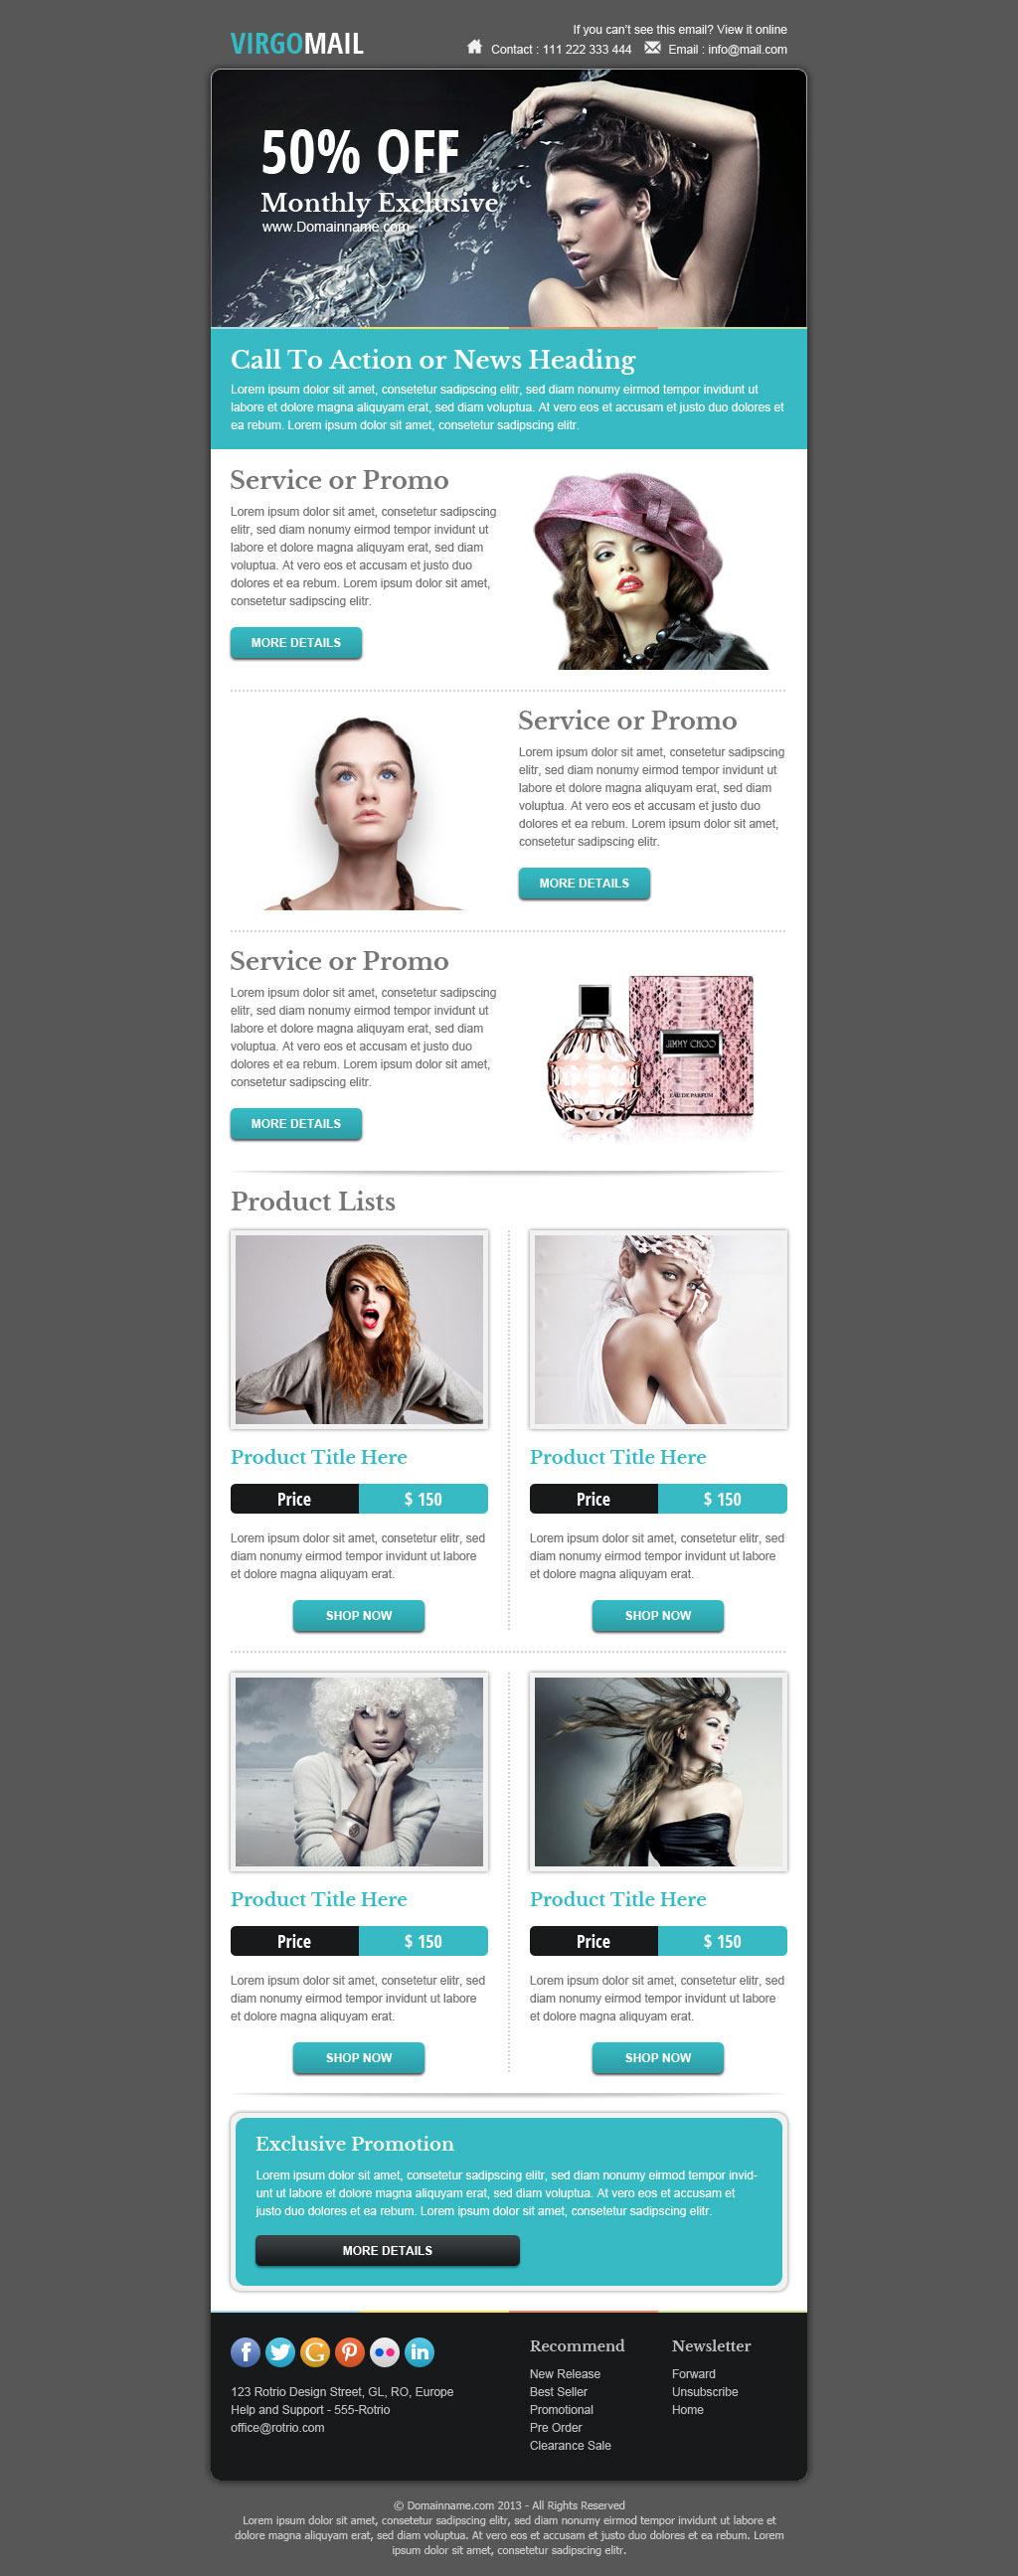 virgomail email marketing newsletter template by. Black Bedroom Furniture Sets. Home Design Ideas